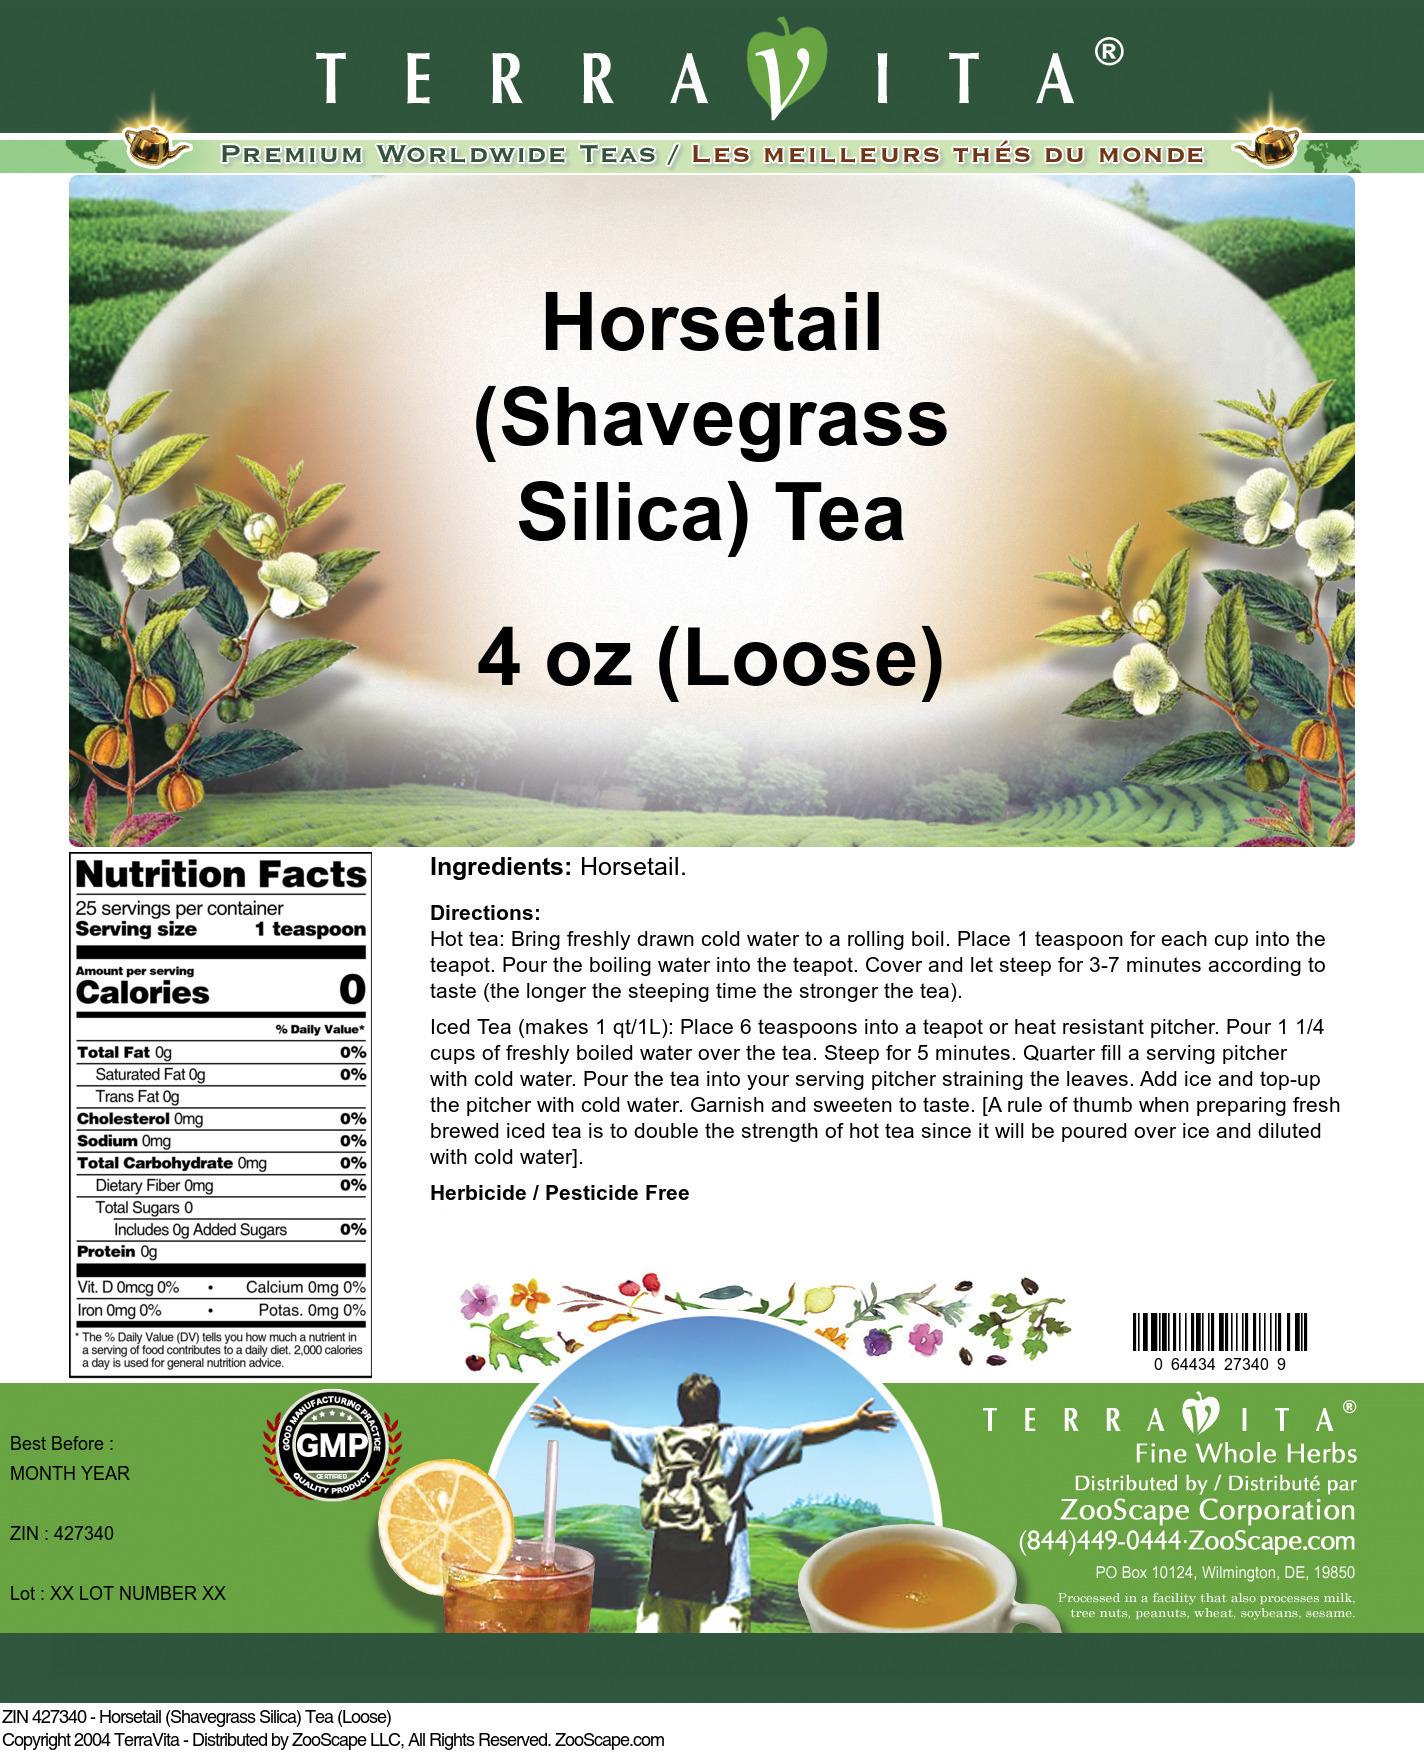 Horsetail (Shavegrass Silica) Tea (Loose) - Label